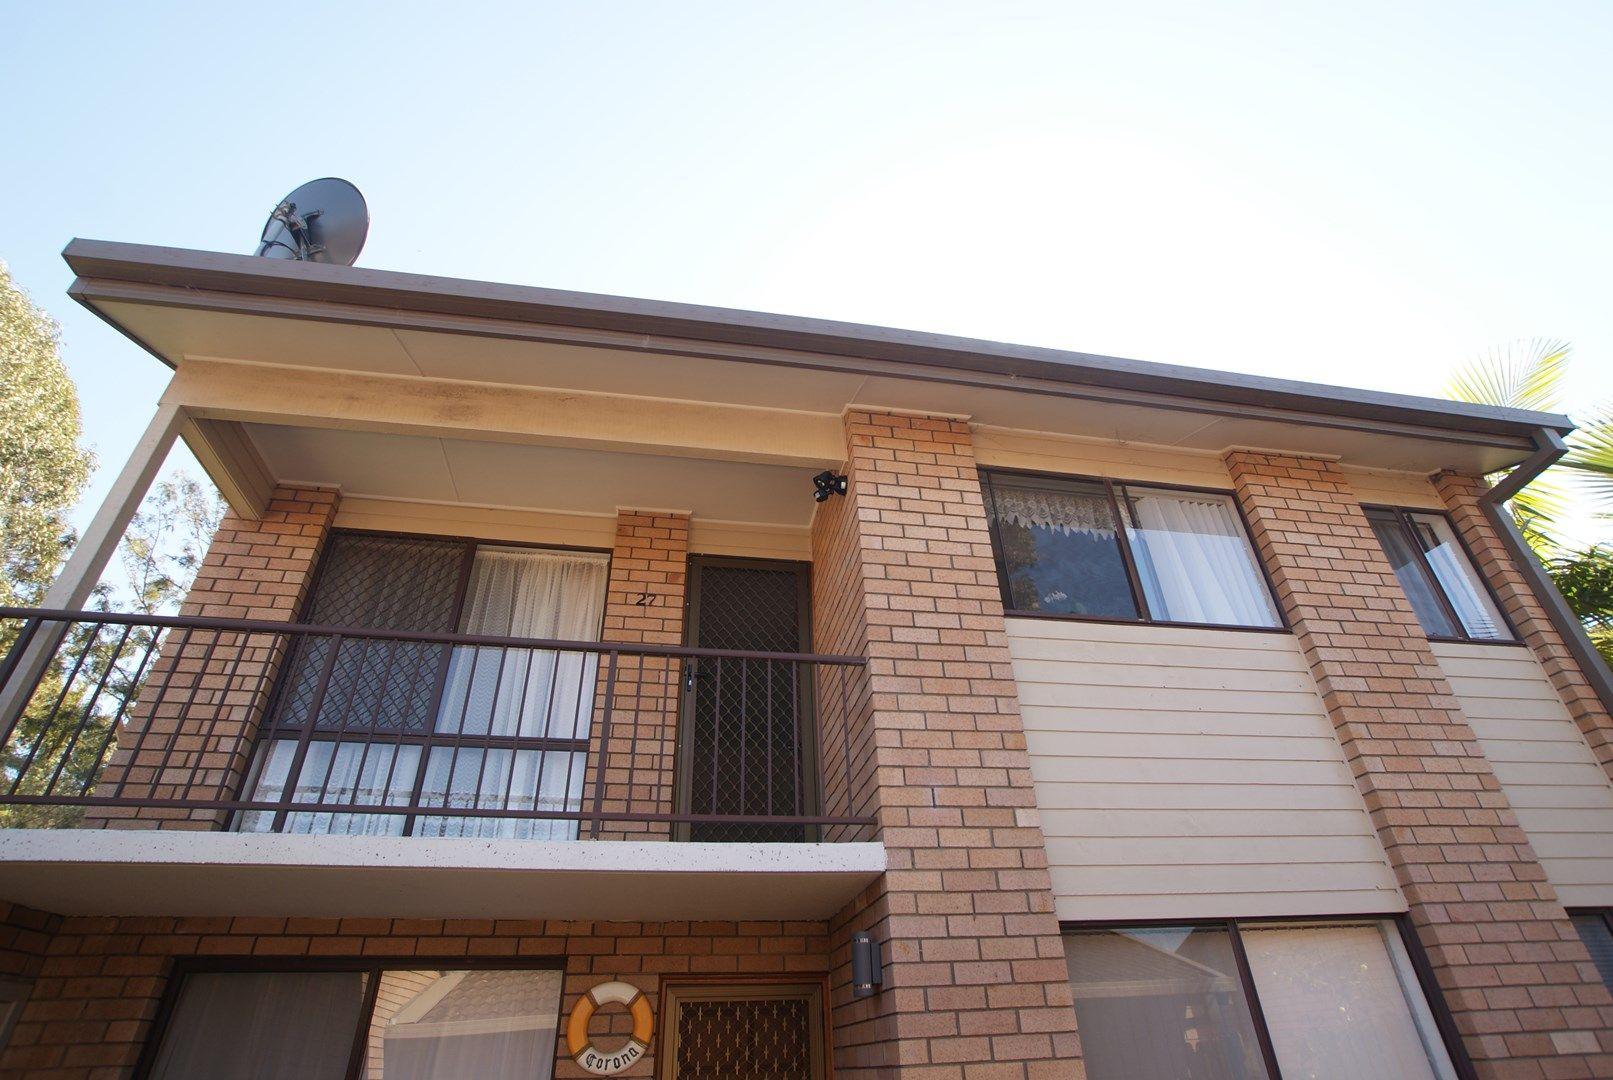 27/1-9 Wharf Road, North Batemans Bay NSW 2536, Image 0